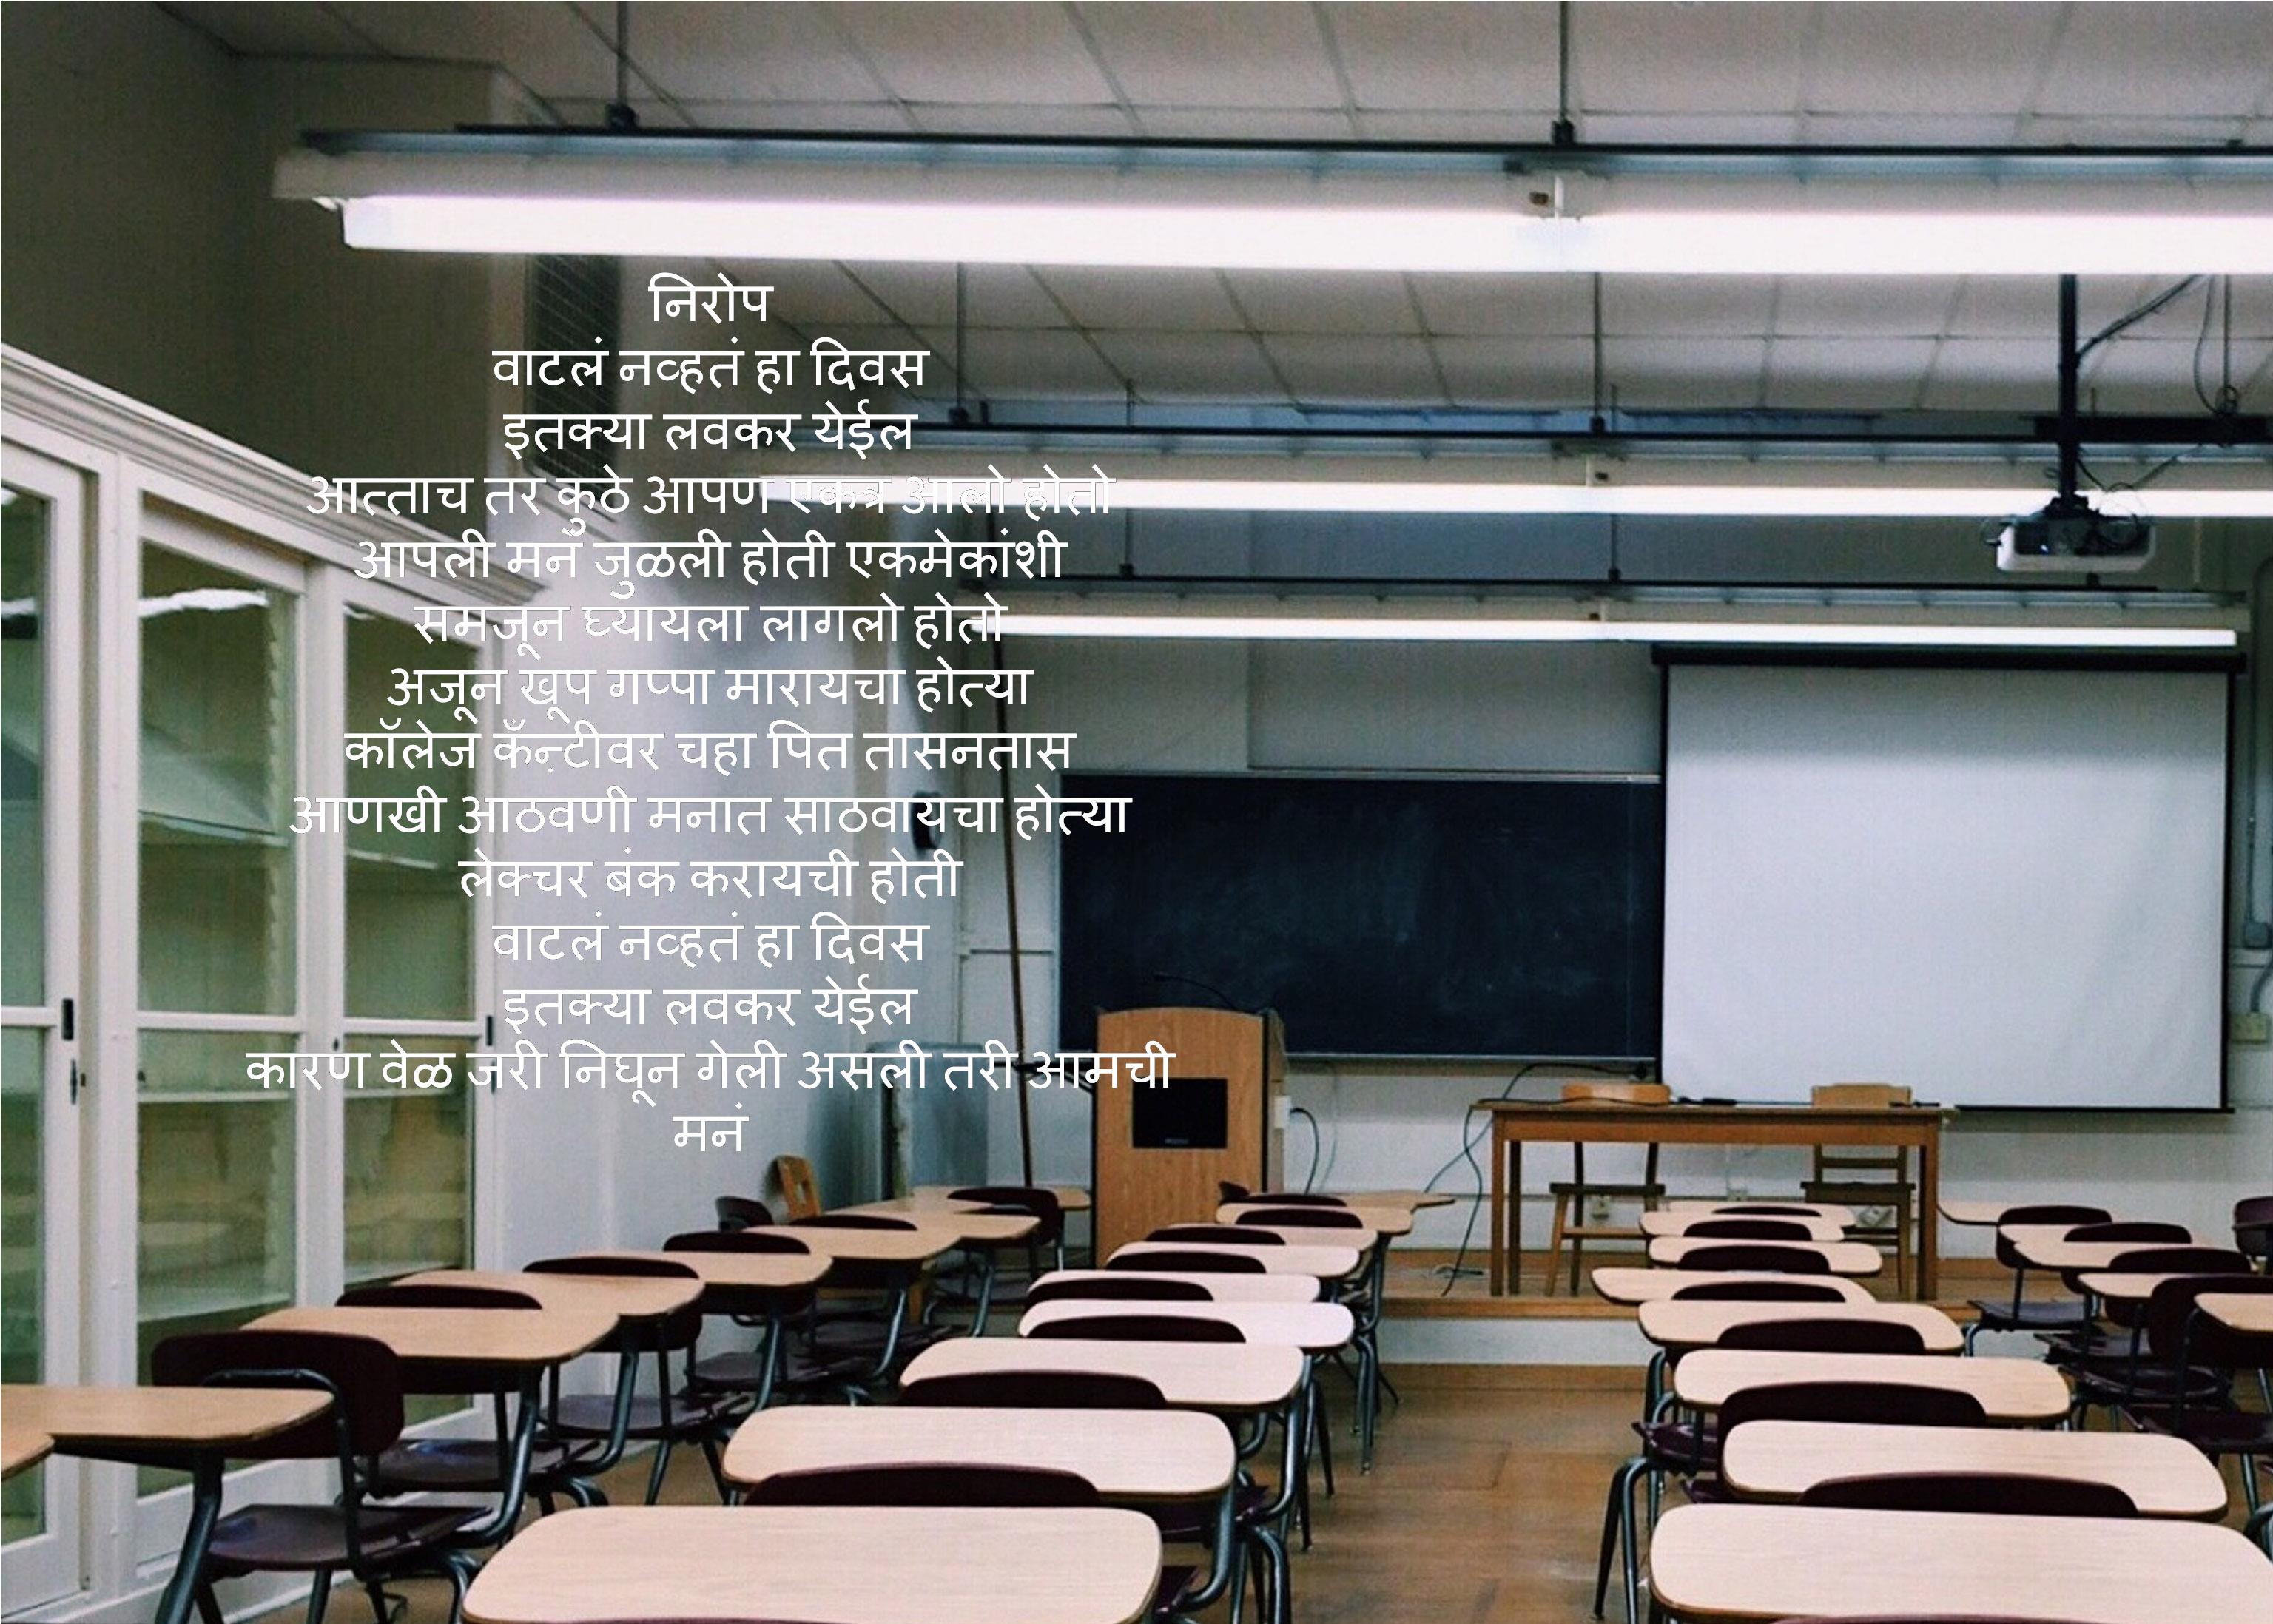 Send off Farewell Party Nirop samarambh College Nirop Poems Kavita in Marathi Language